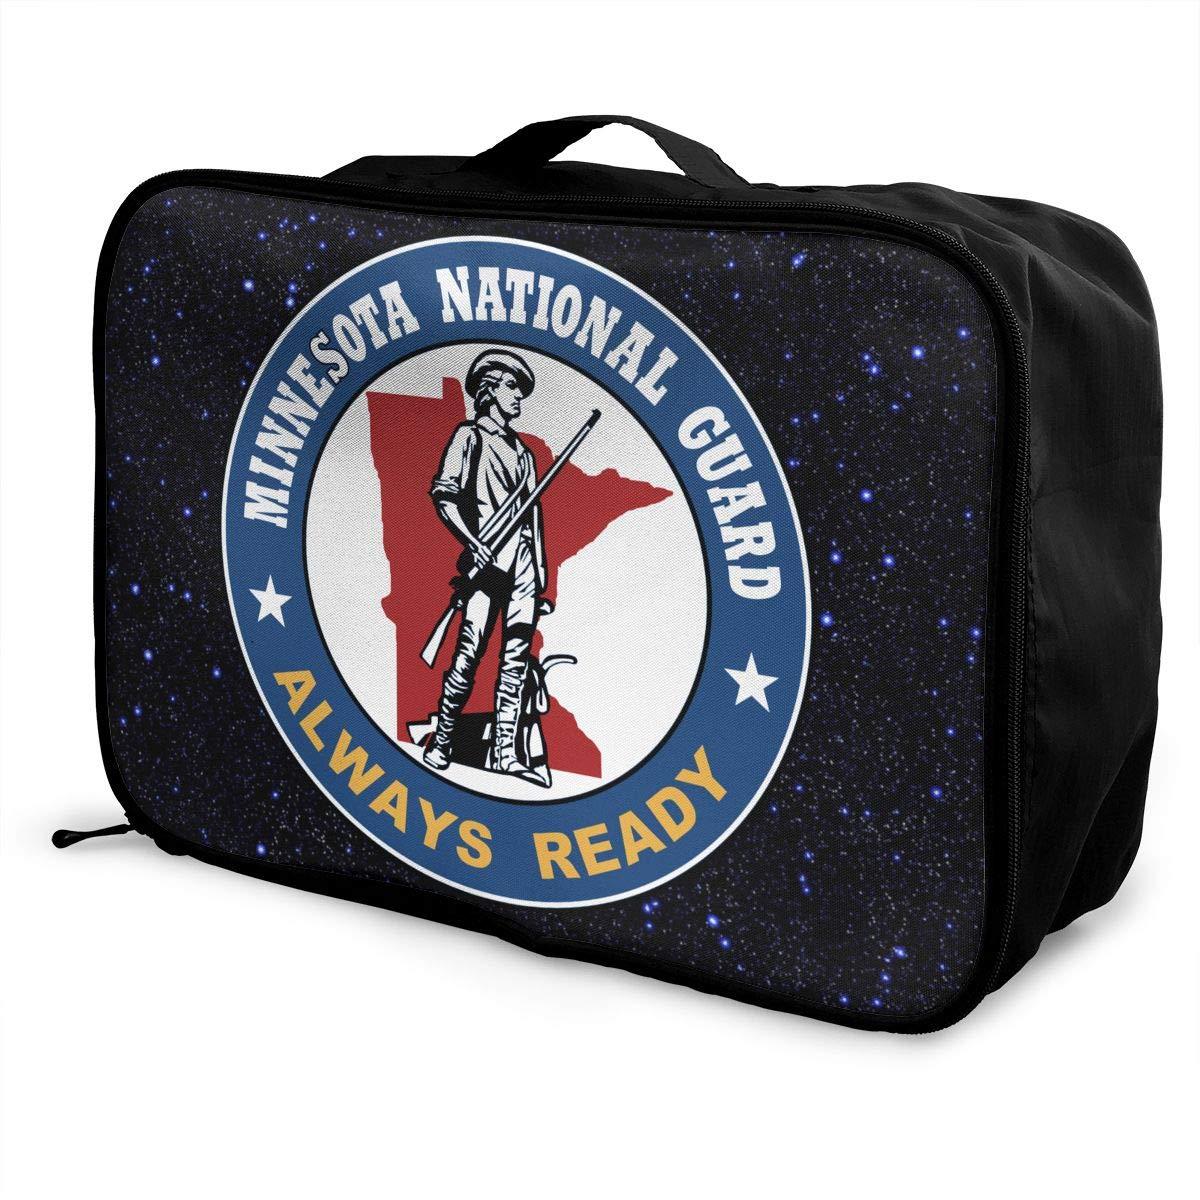 Unisex Travel Duffel Bag Waterproof Fashion Lightweight Large Capacity Portable Luggage Bag Minnesota National